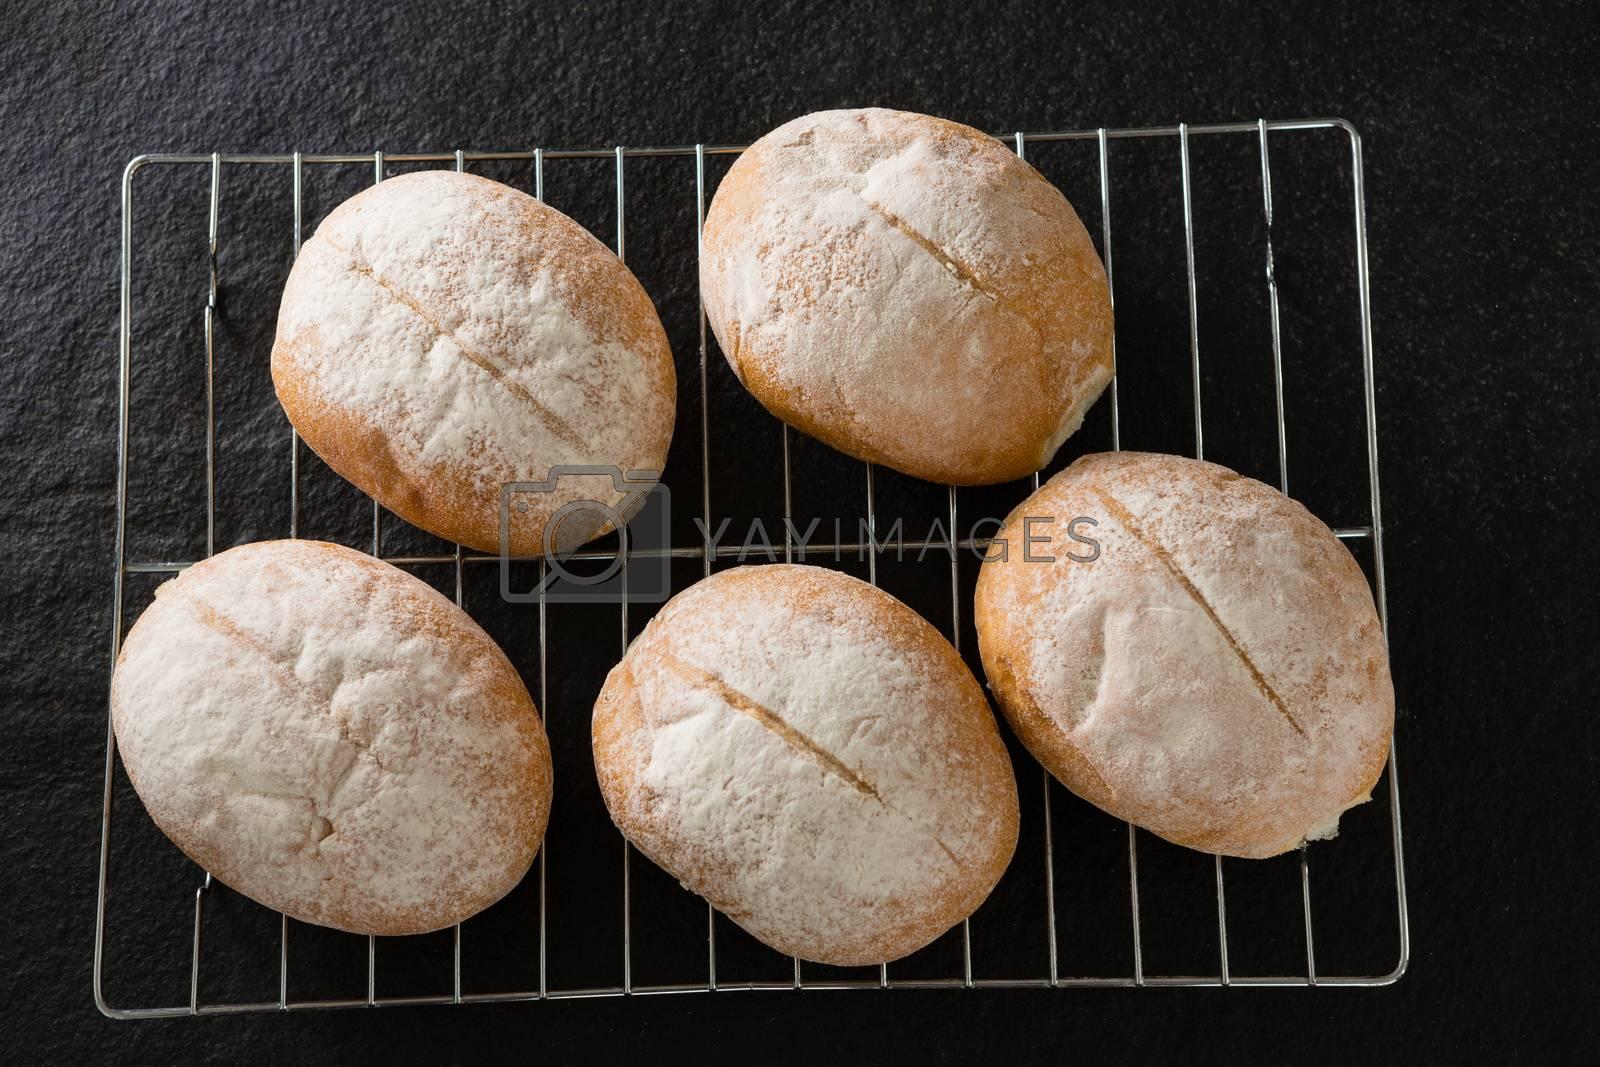 Dough balls with icing sugar on baking tray by Wavebreakmedia